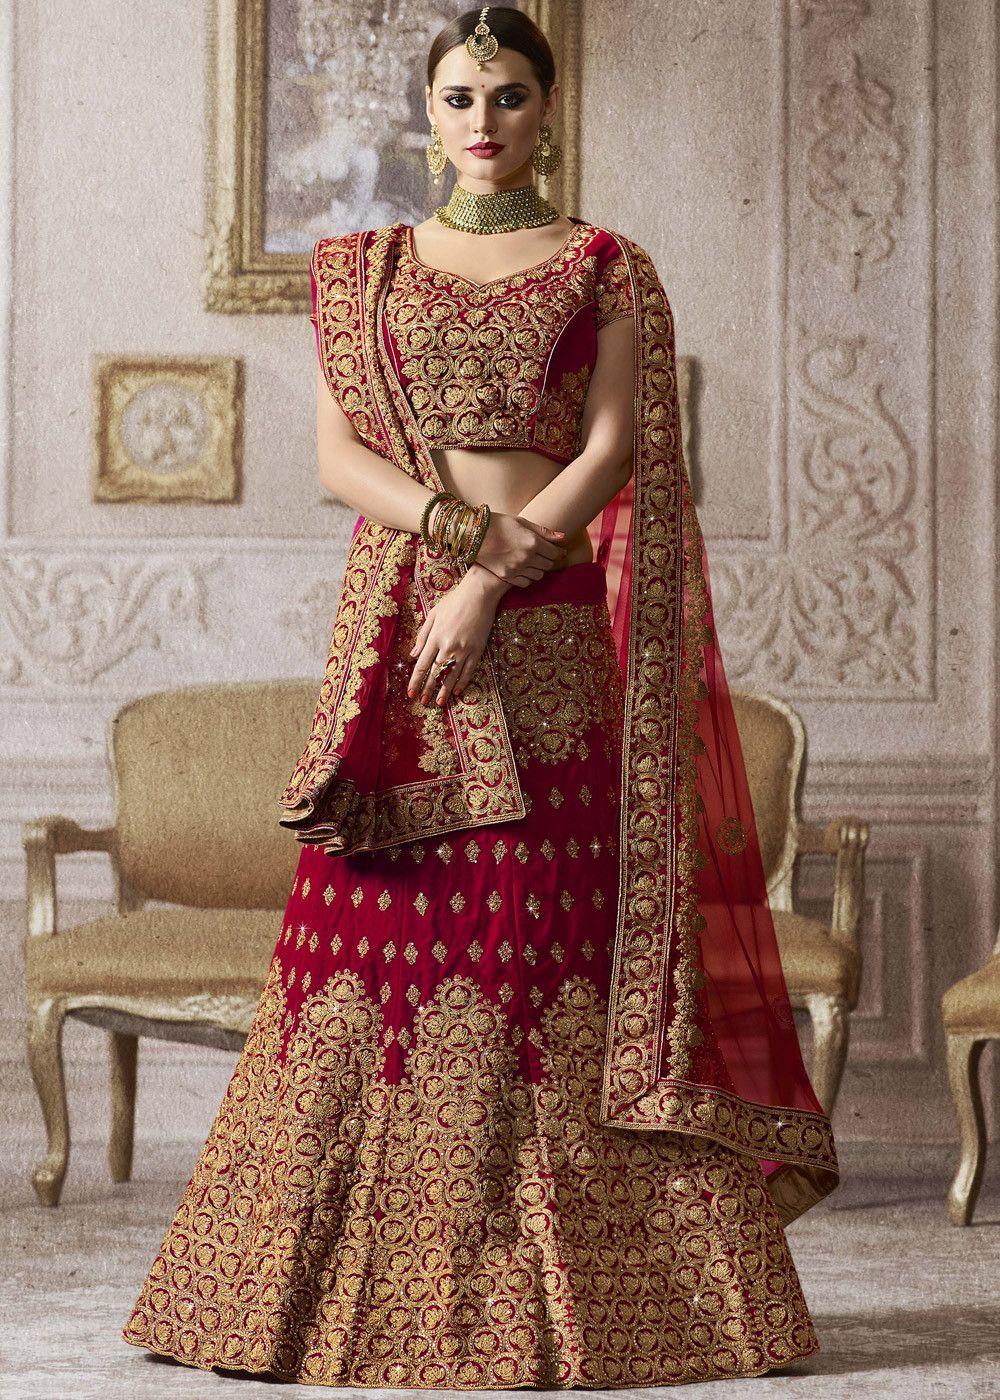 0eac0a83b0 Magenta Velvet #Bridal #Lehenga #Choli with all over heavy zari embroidery  and kundan work.